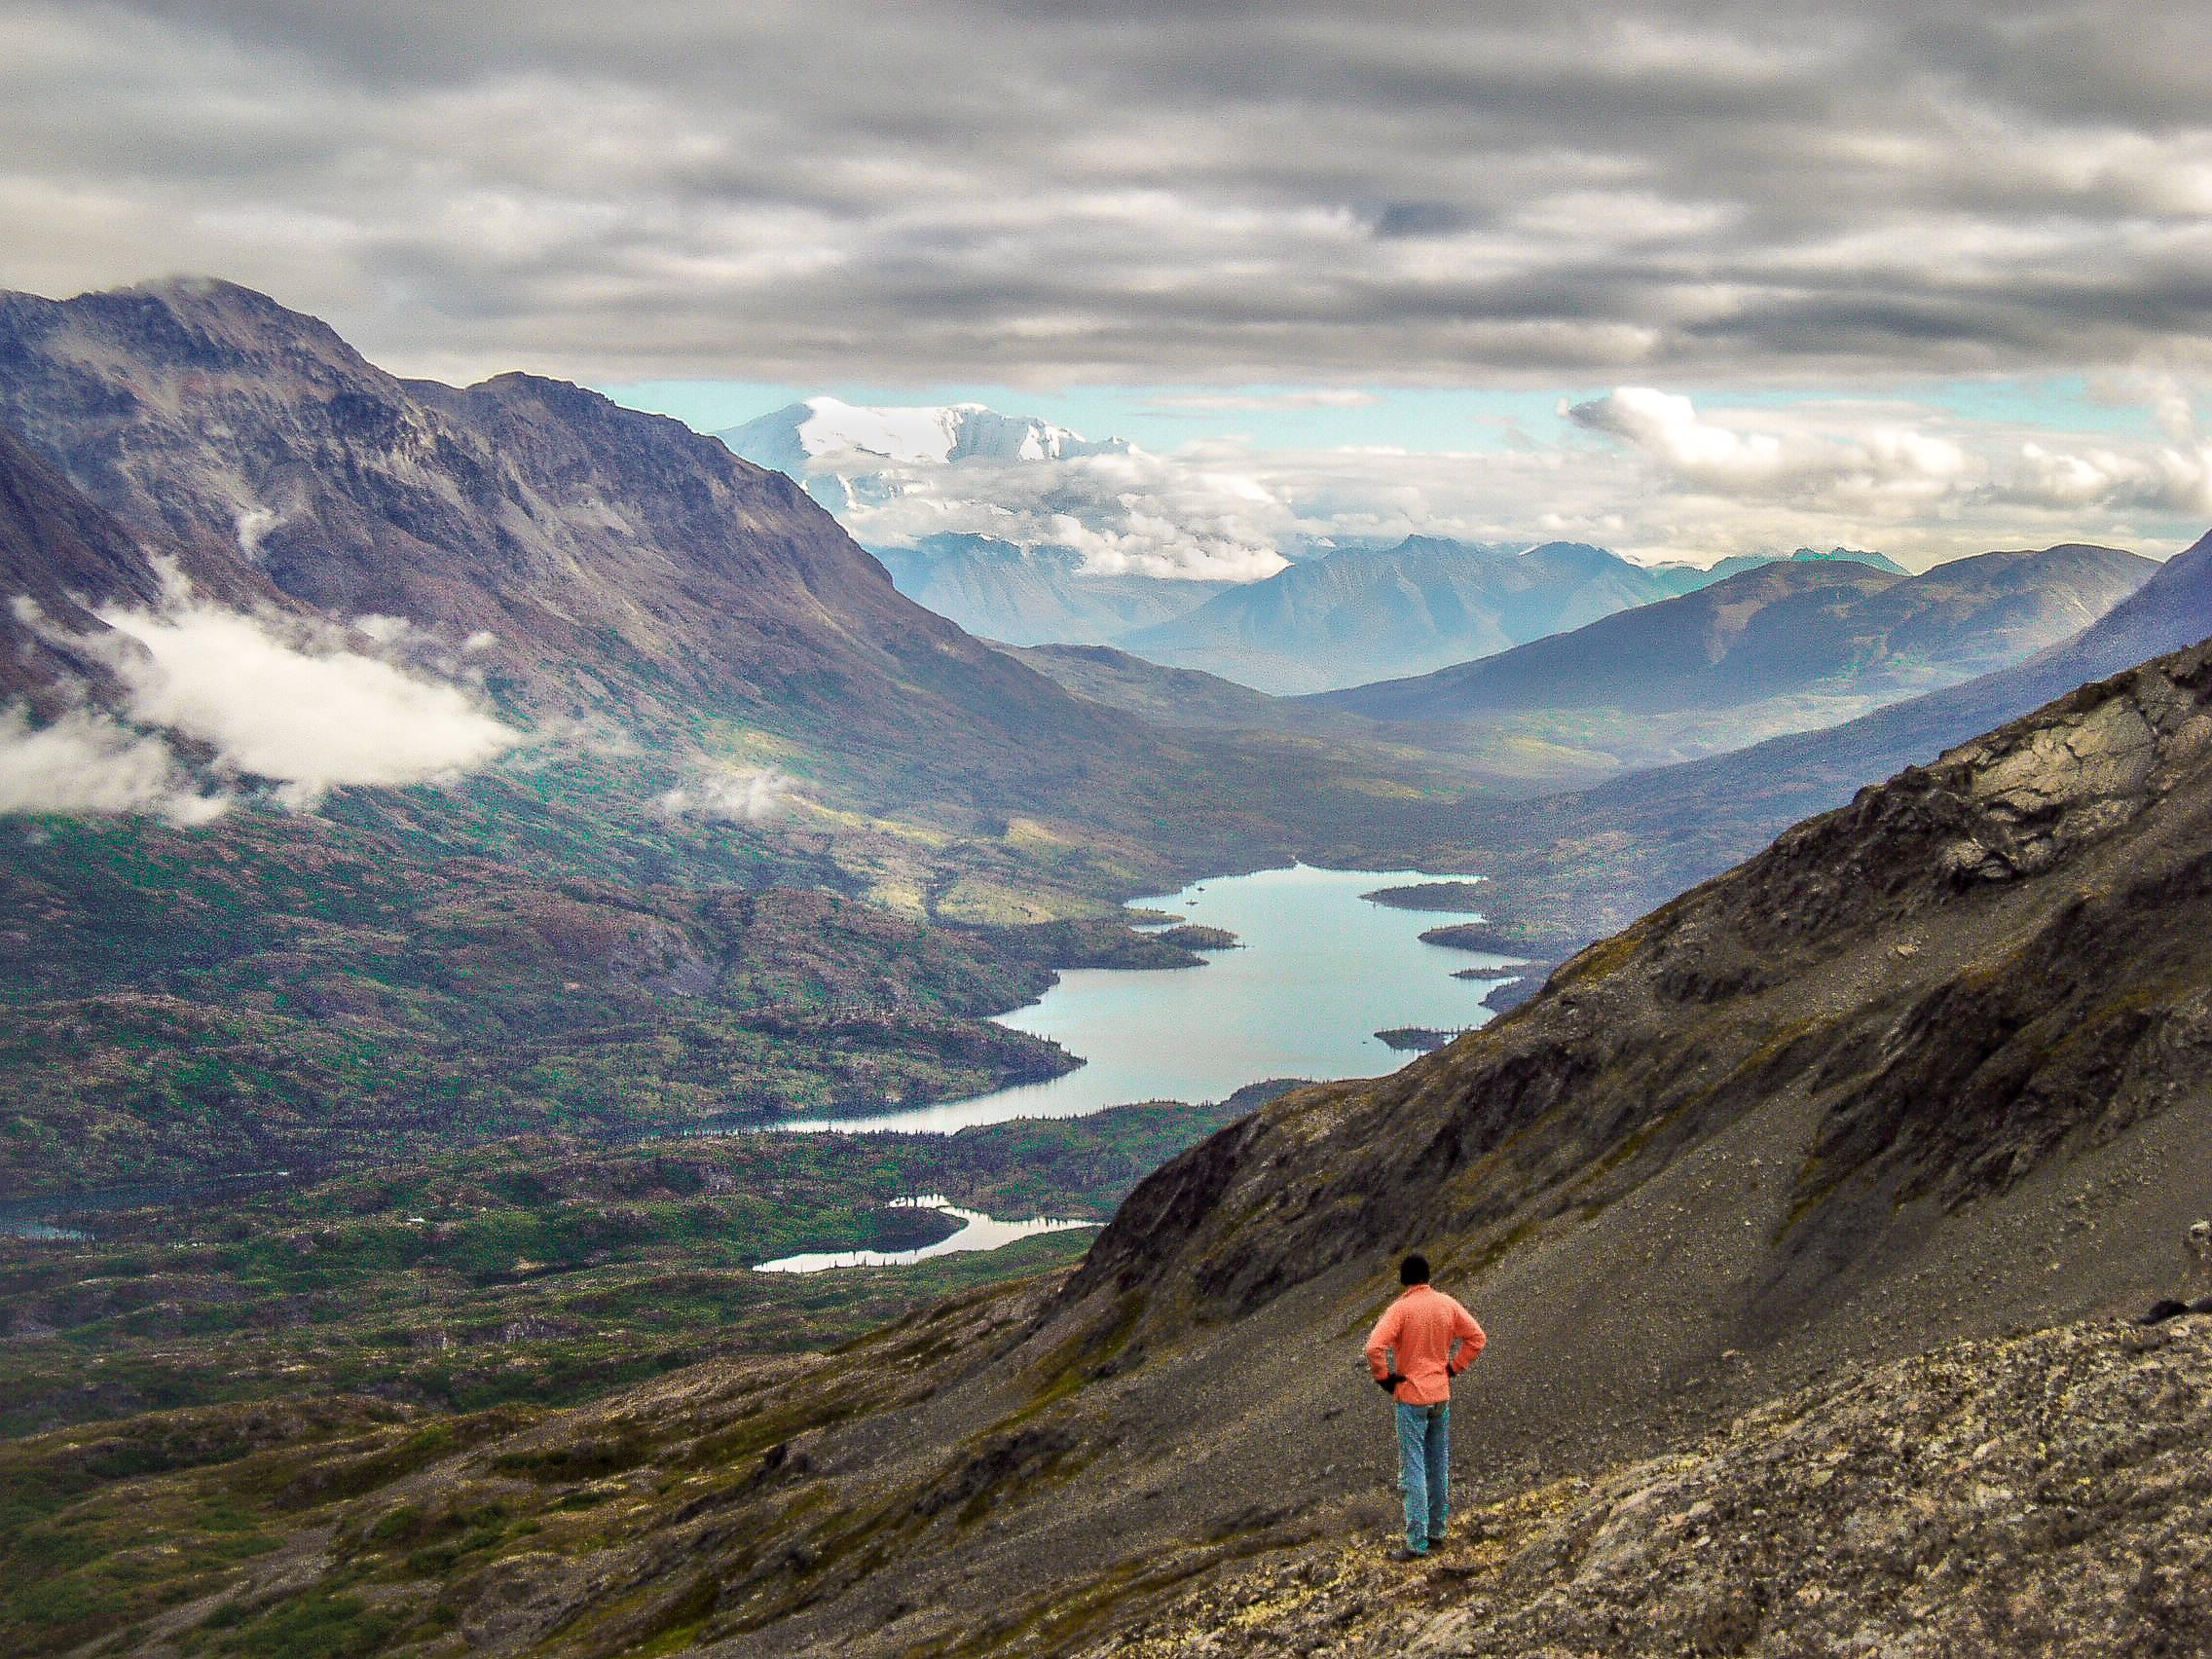 Basecamping Drop-Off: Hiker's first look at Tebay Lakes